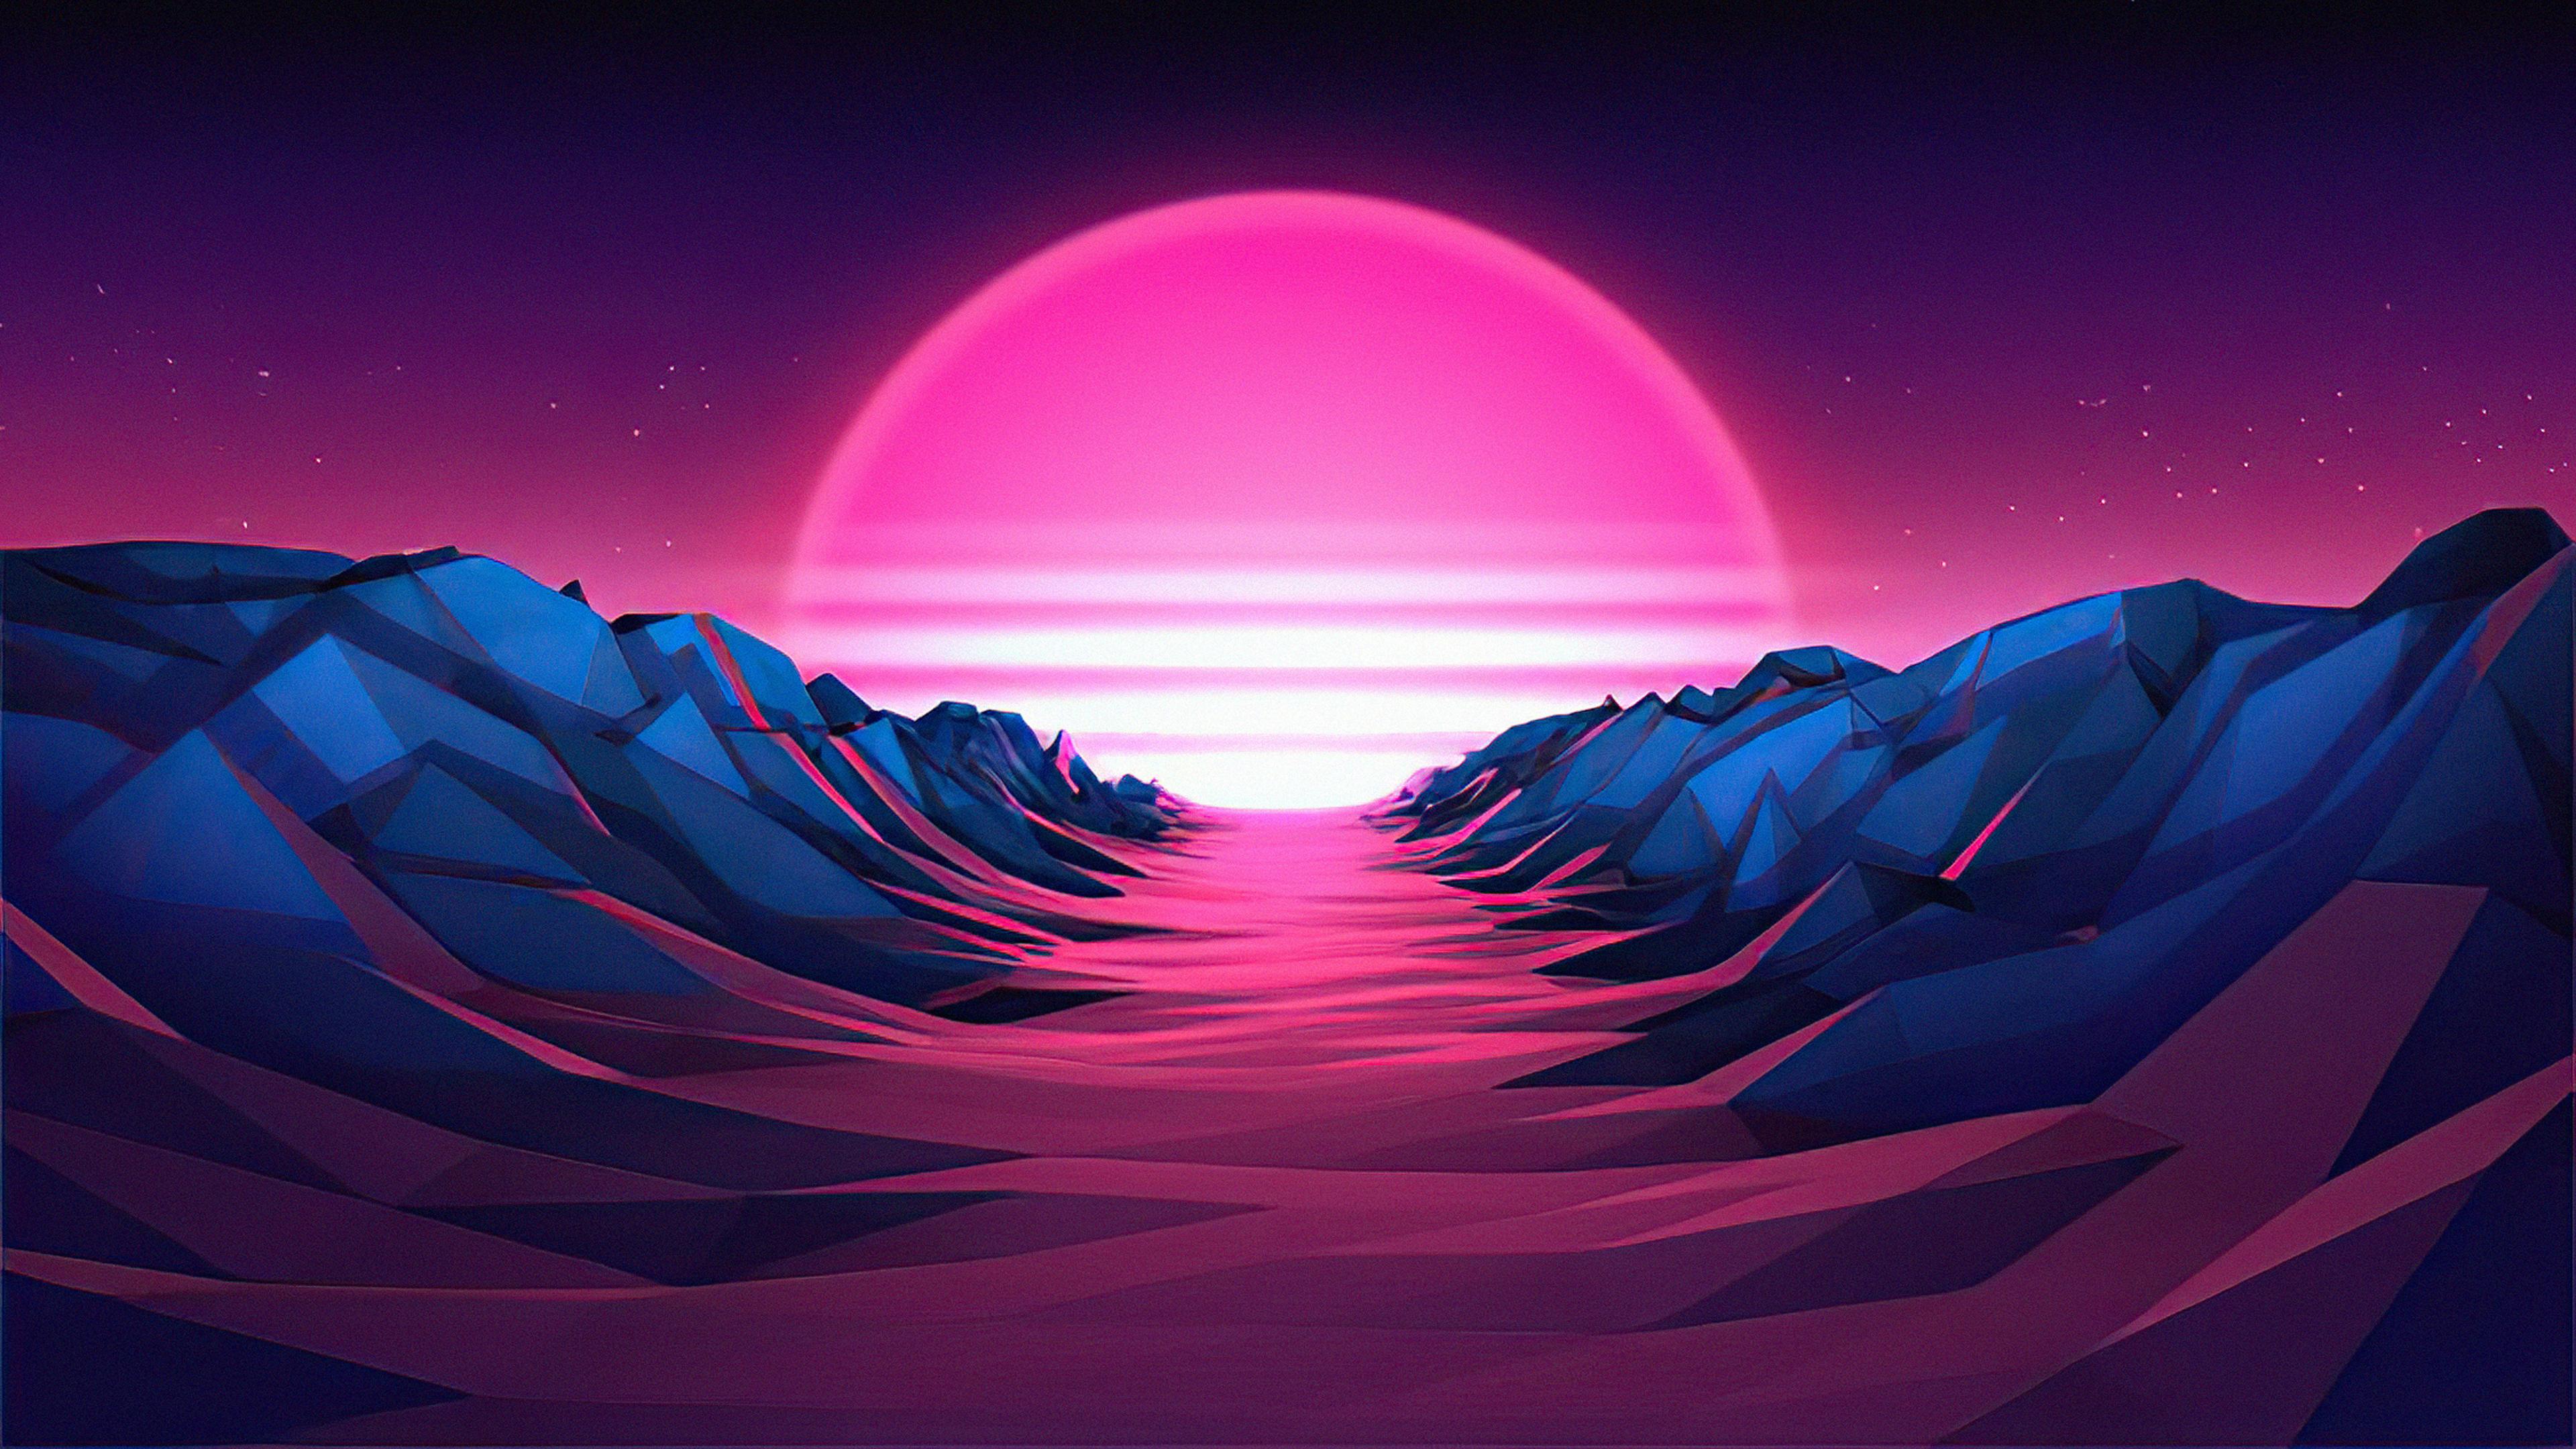 Purple Sunrise 4K Vaporwave Wallpaper, HD Artist 4K ...